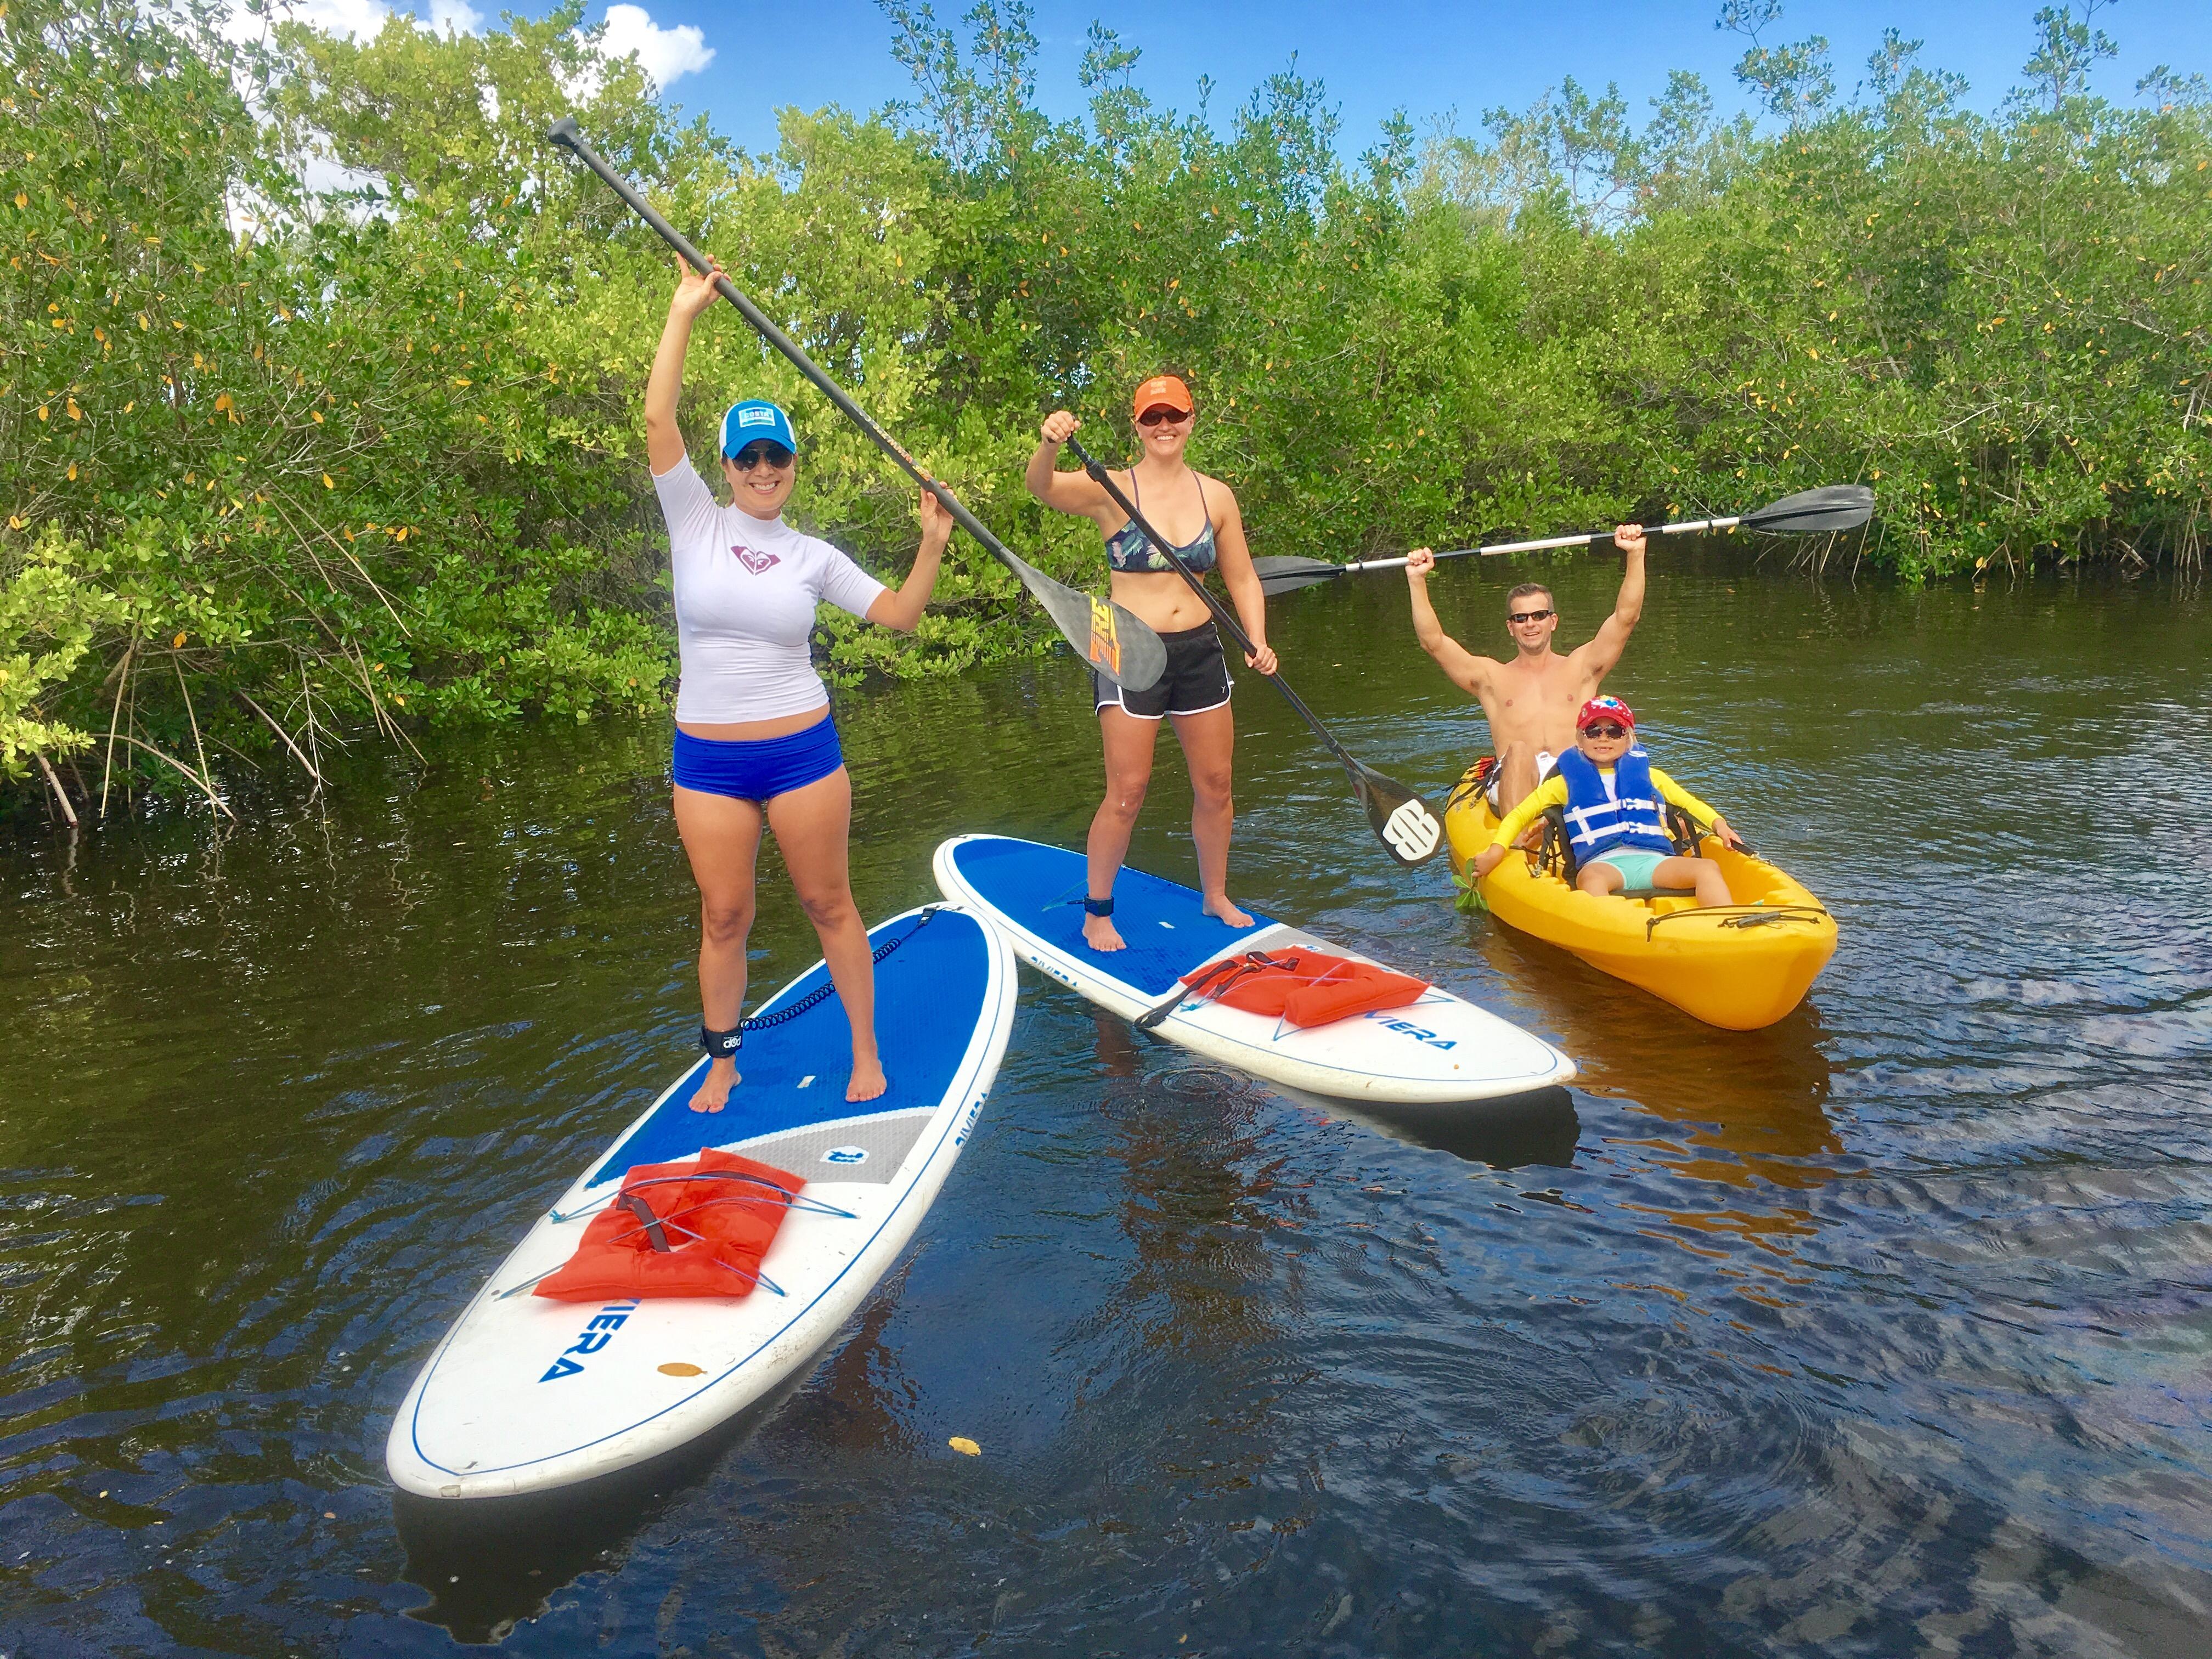 SoBe Surf Paddle Board SUP rentals Kayak Rentals Paddle Board Tours Kayak Tours Florida